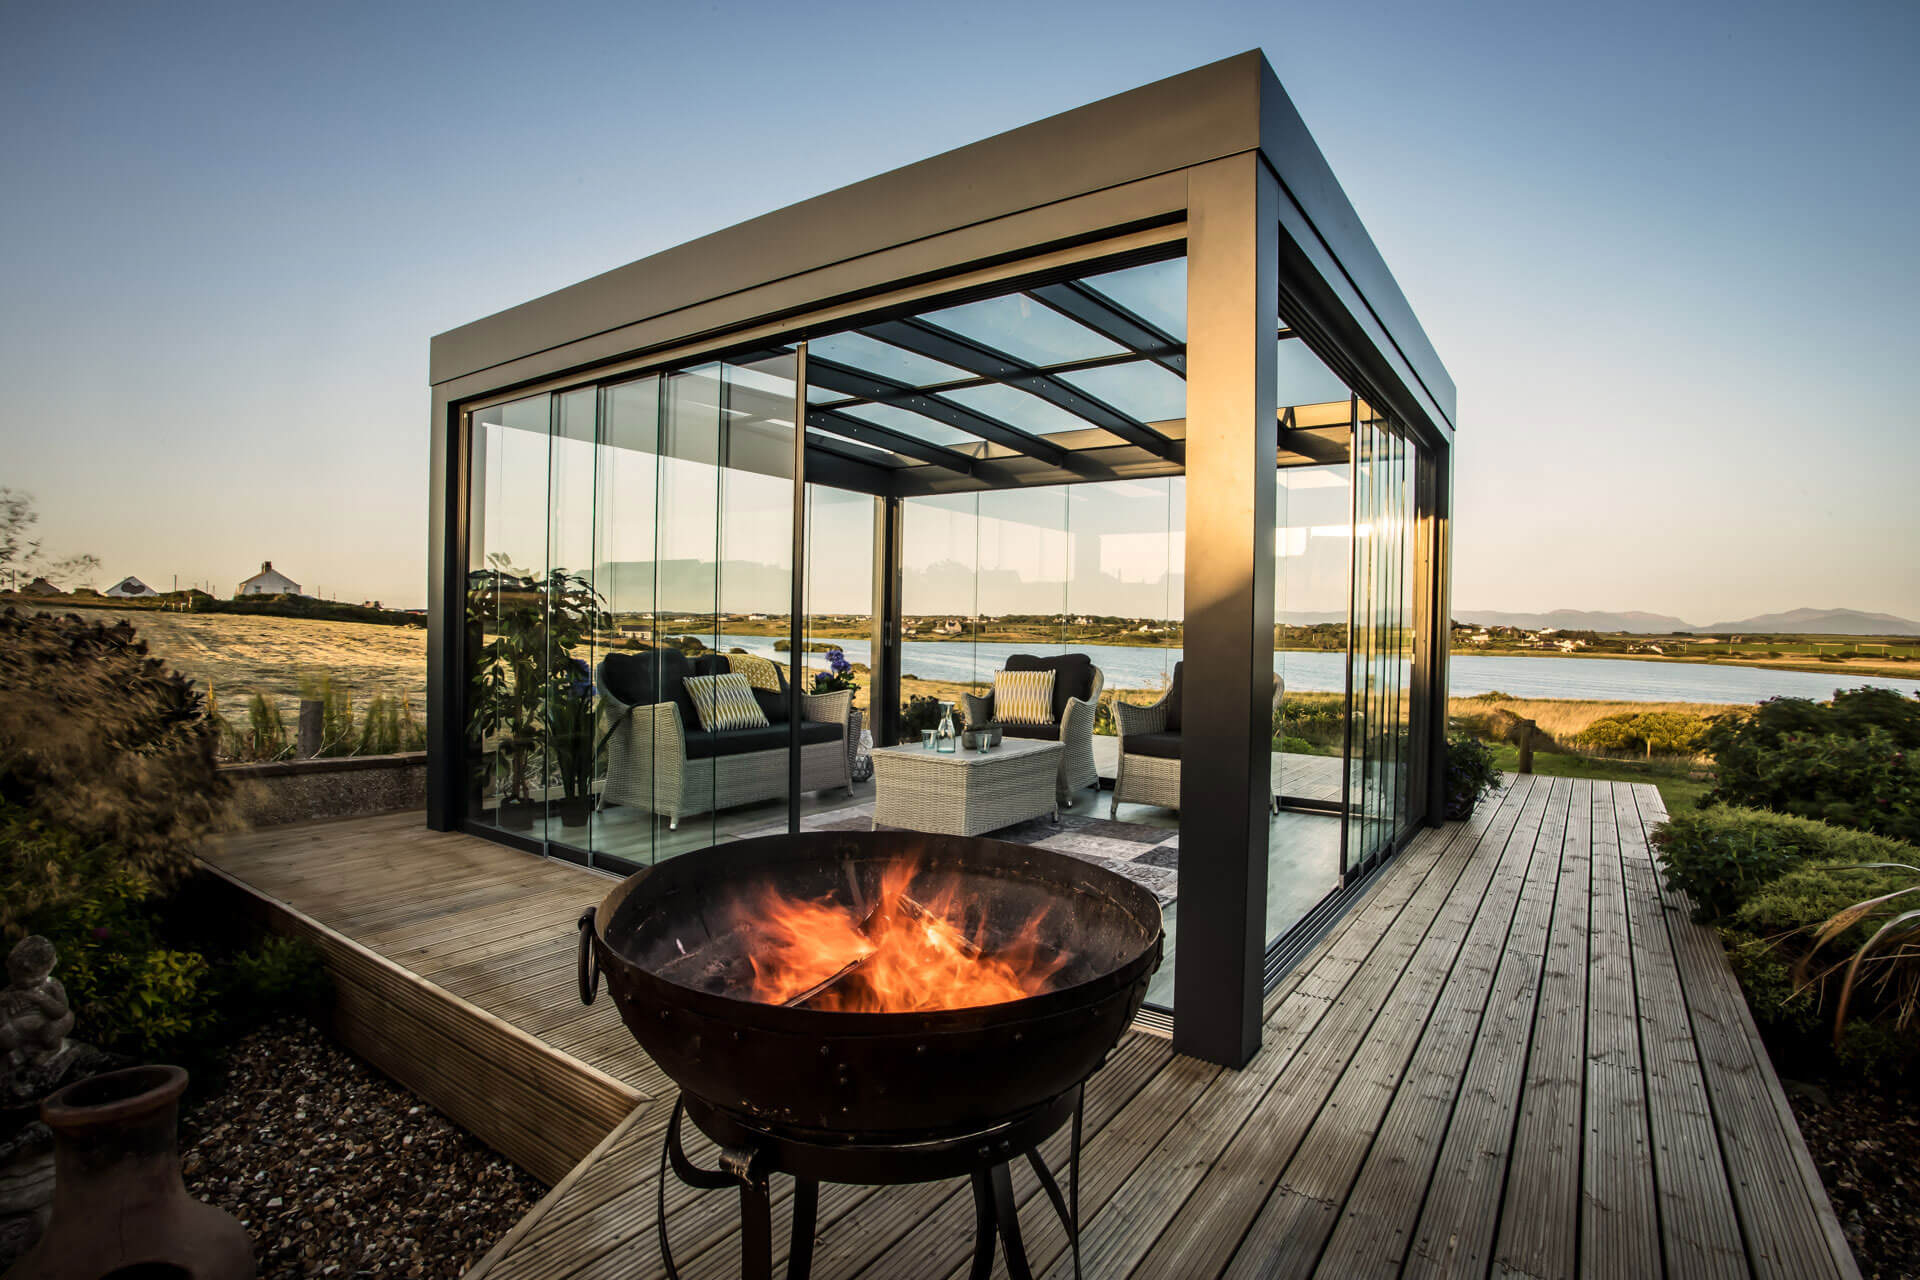 Solarlux Glass Canopy SDL Acubis